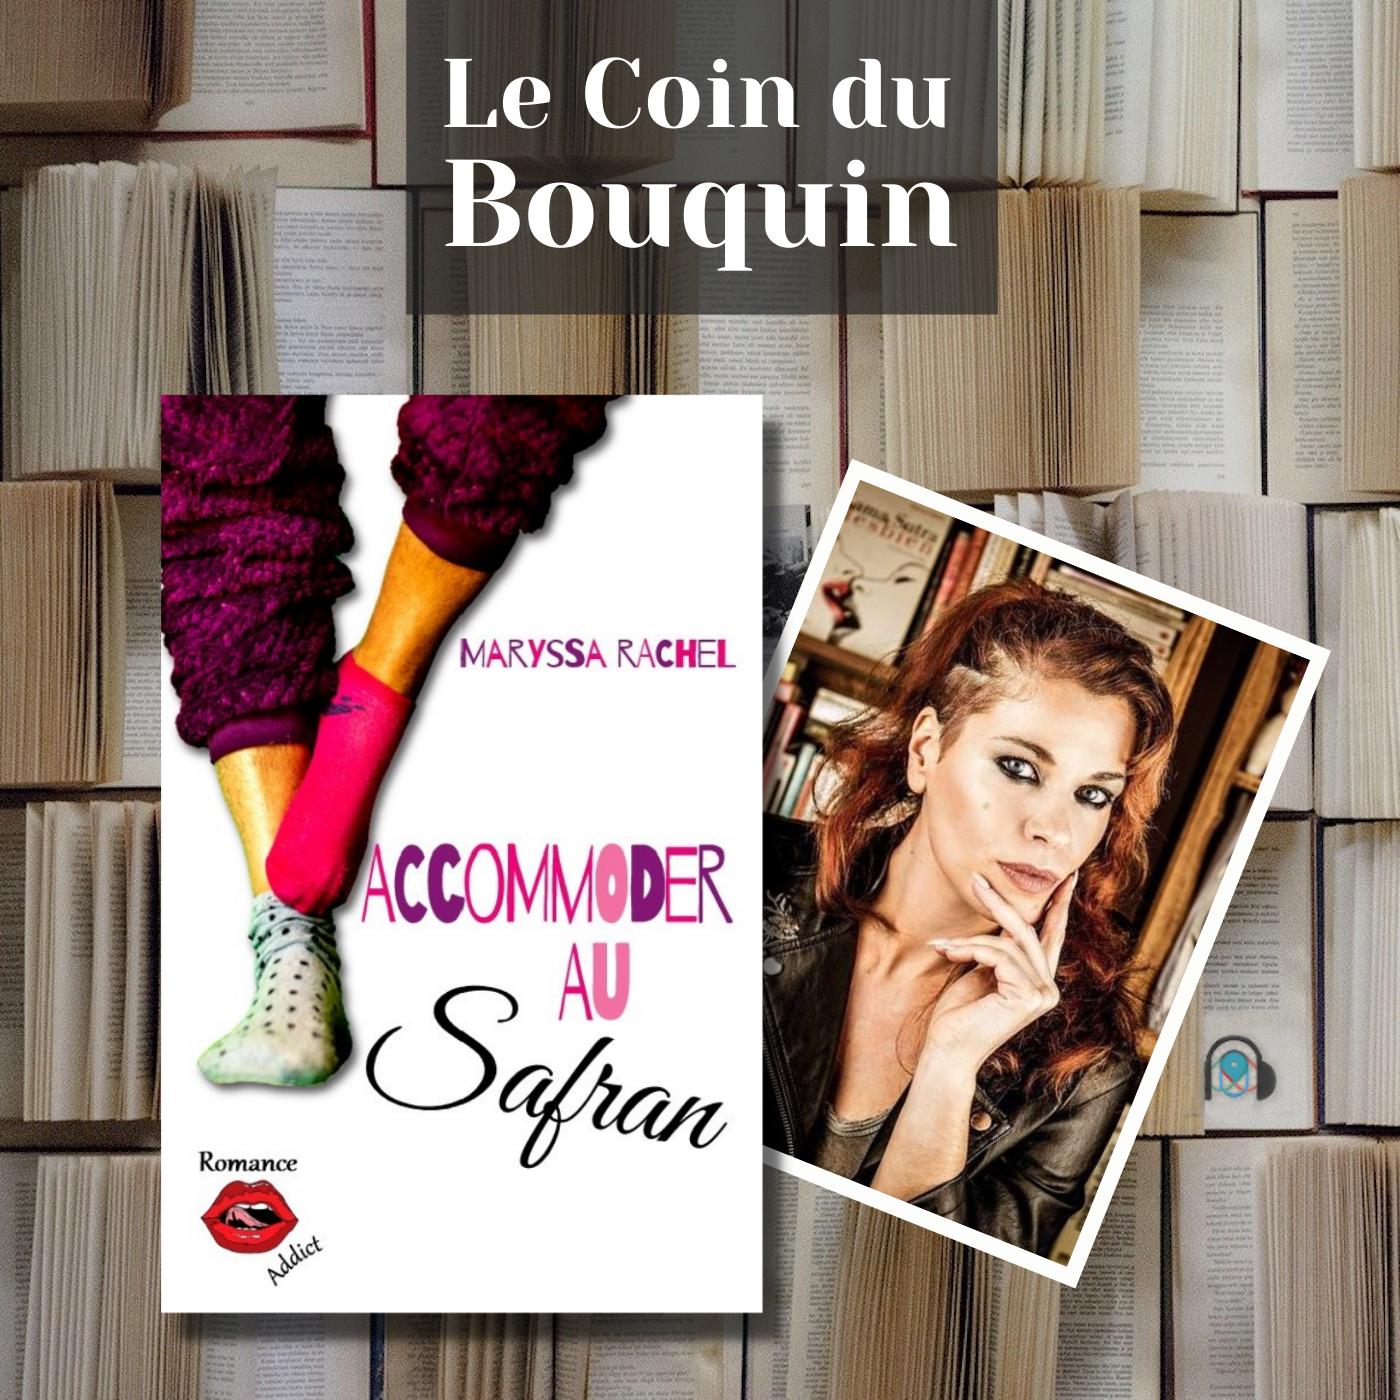 LE COIN DU BOUQUIN : Maryssa RACHEL - Accommoder au Safran